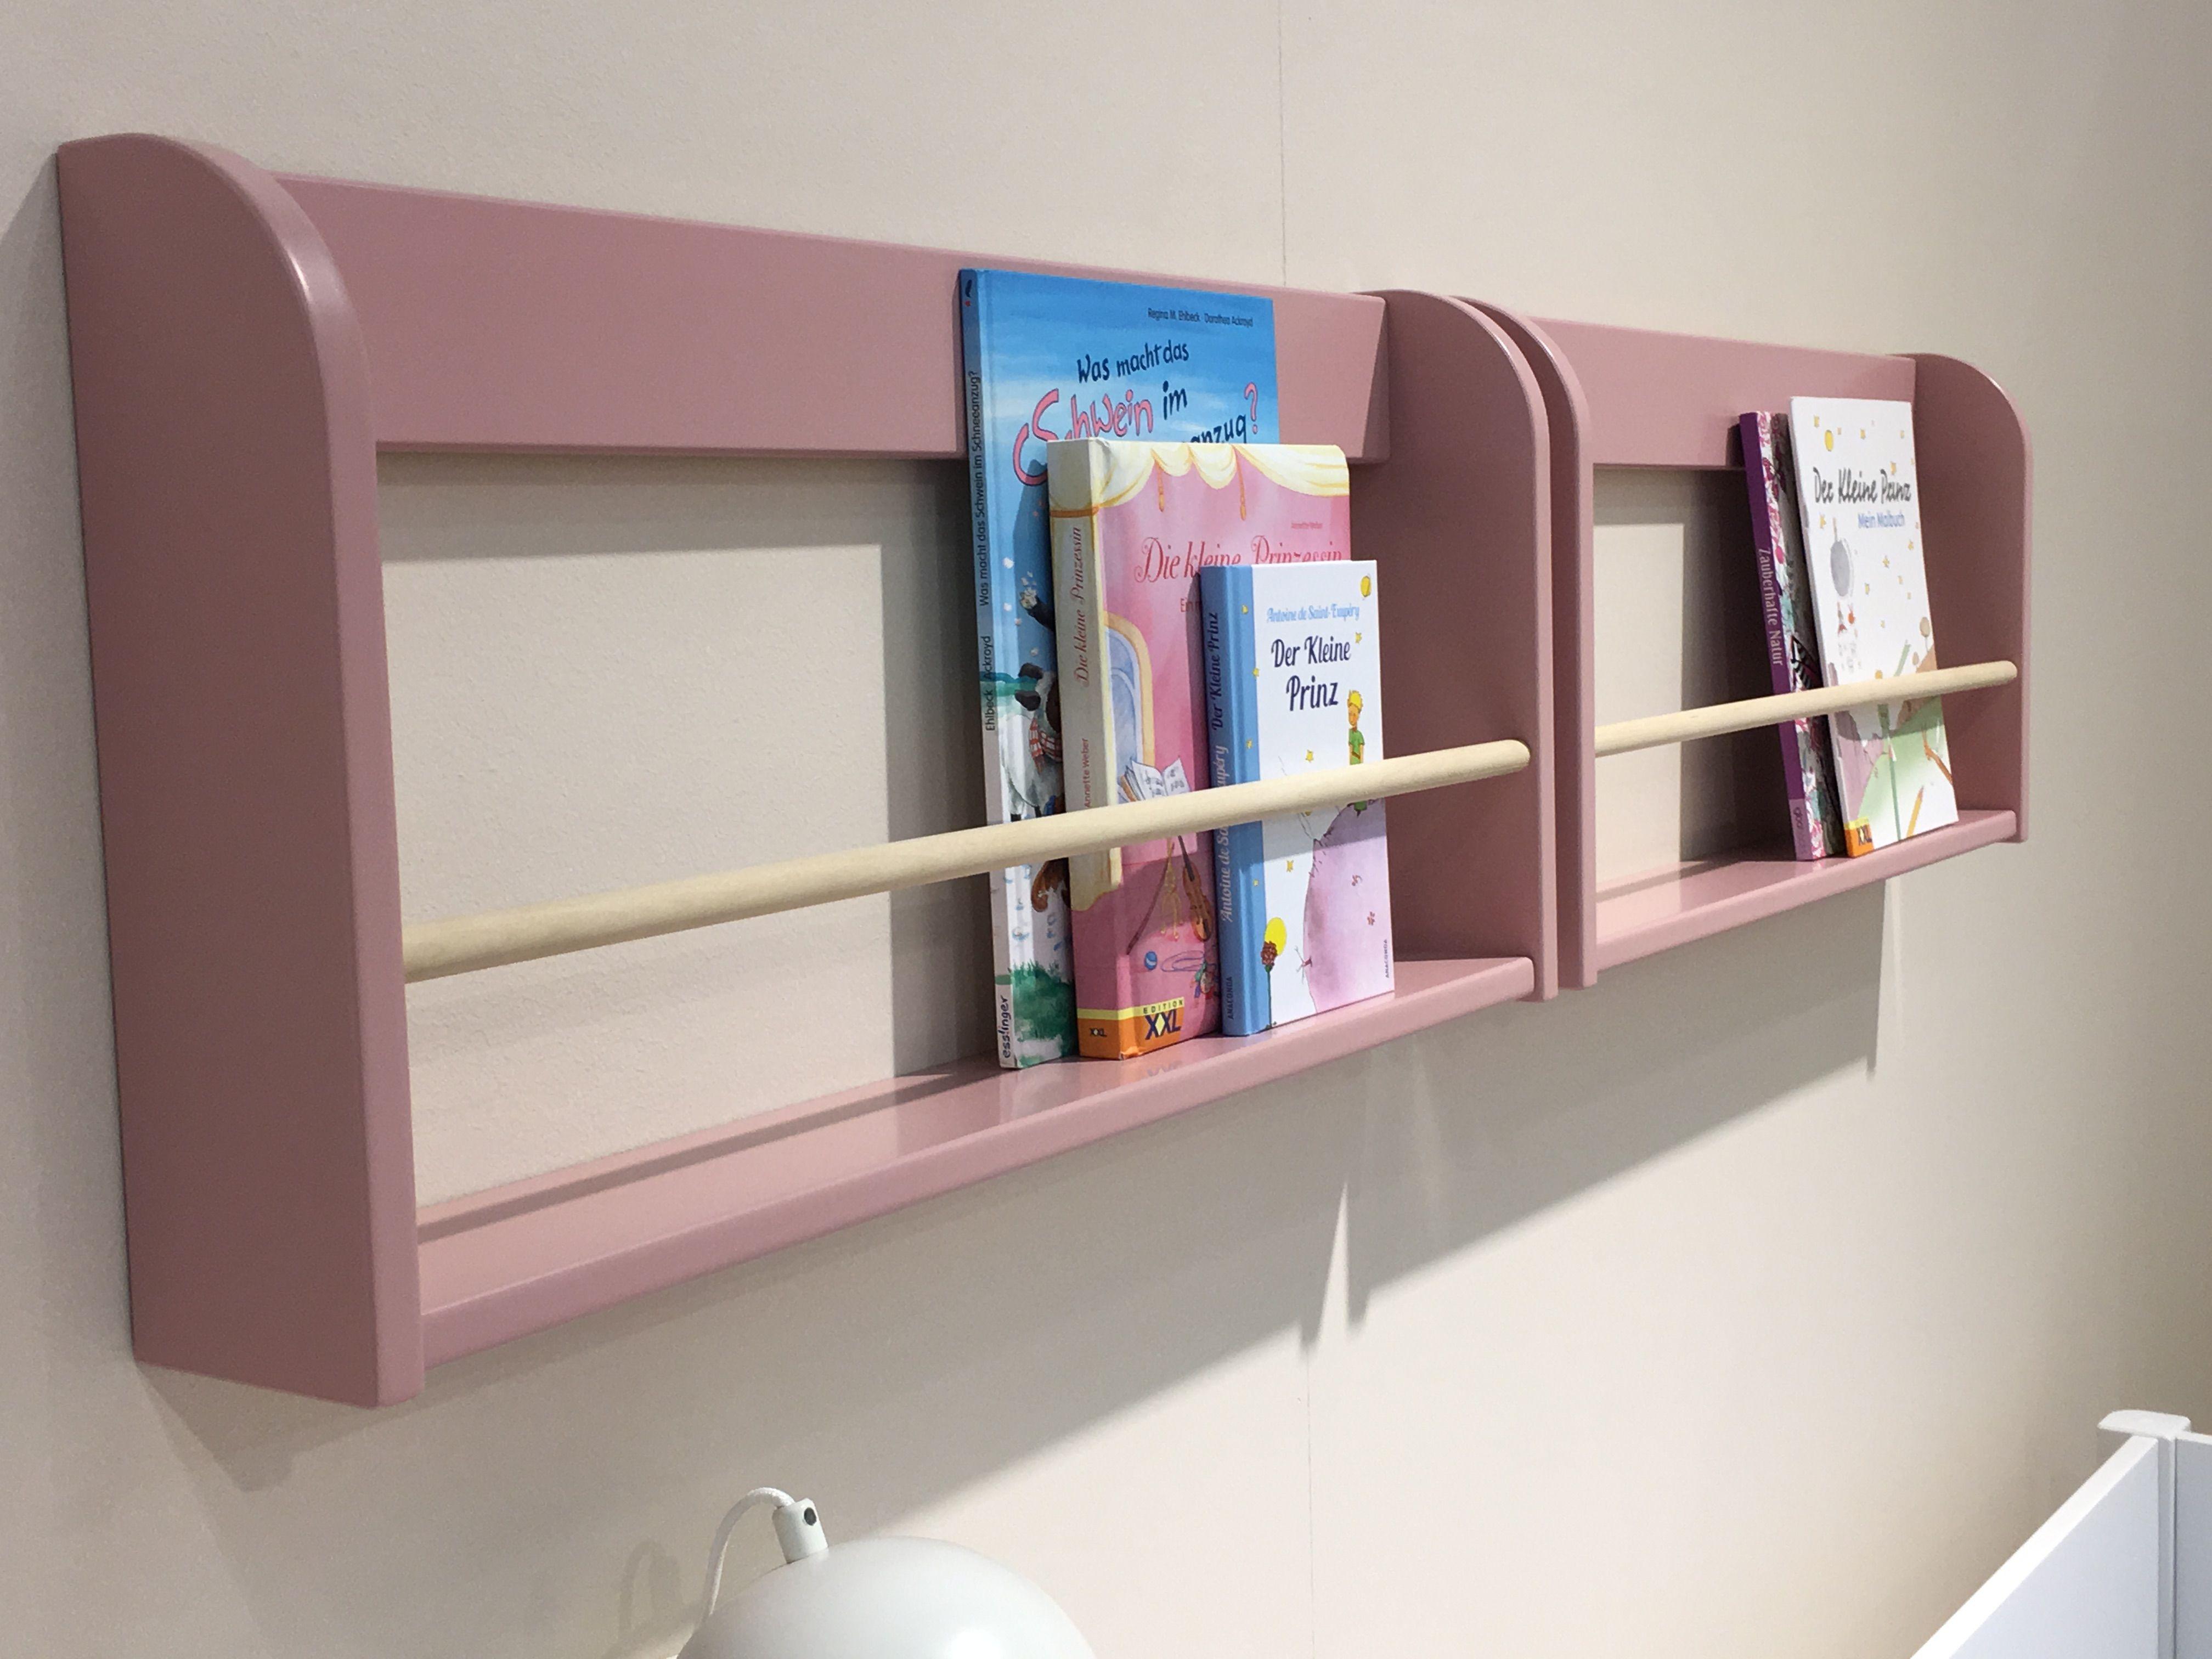 New Flexa Play Display shelf for books l by Flexa World l Charlotte Høncke Design